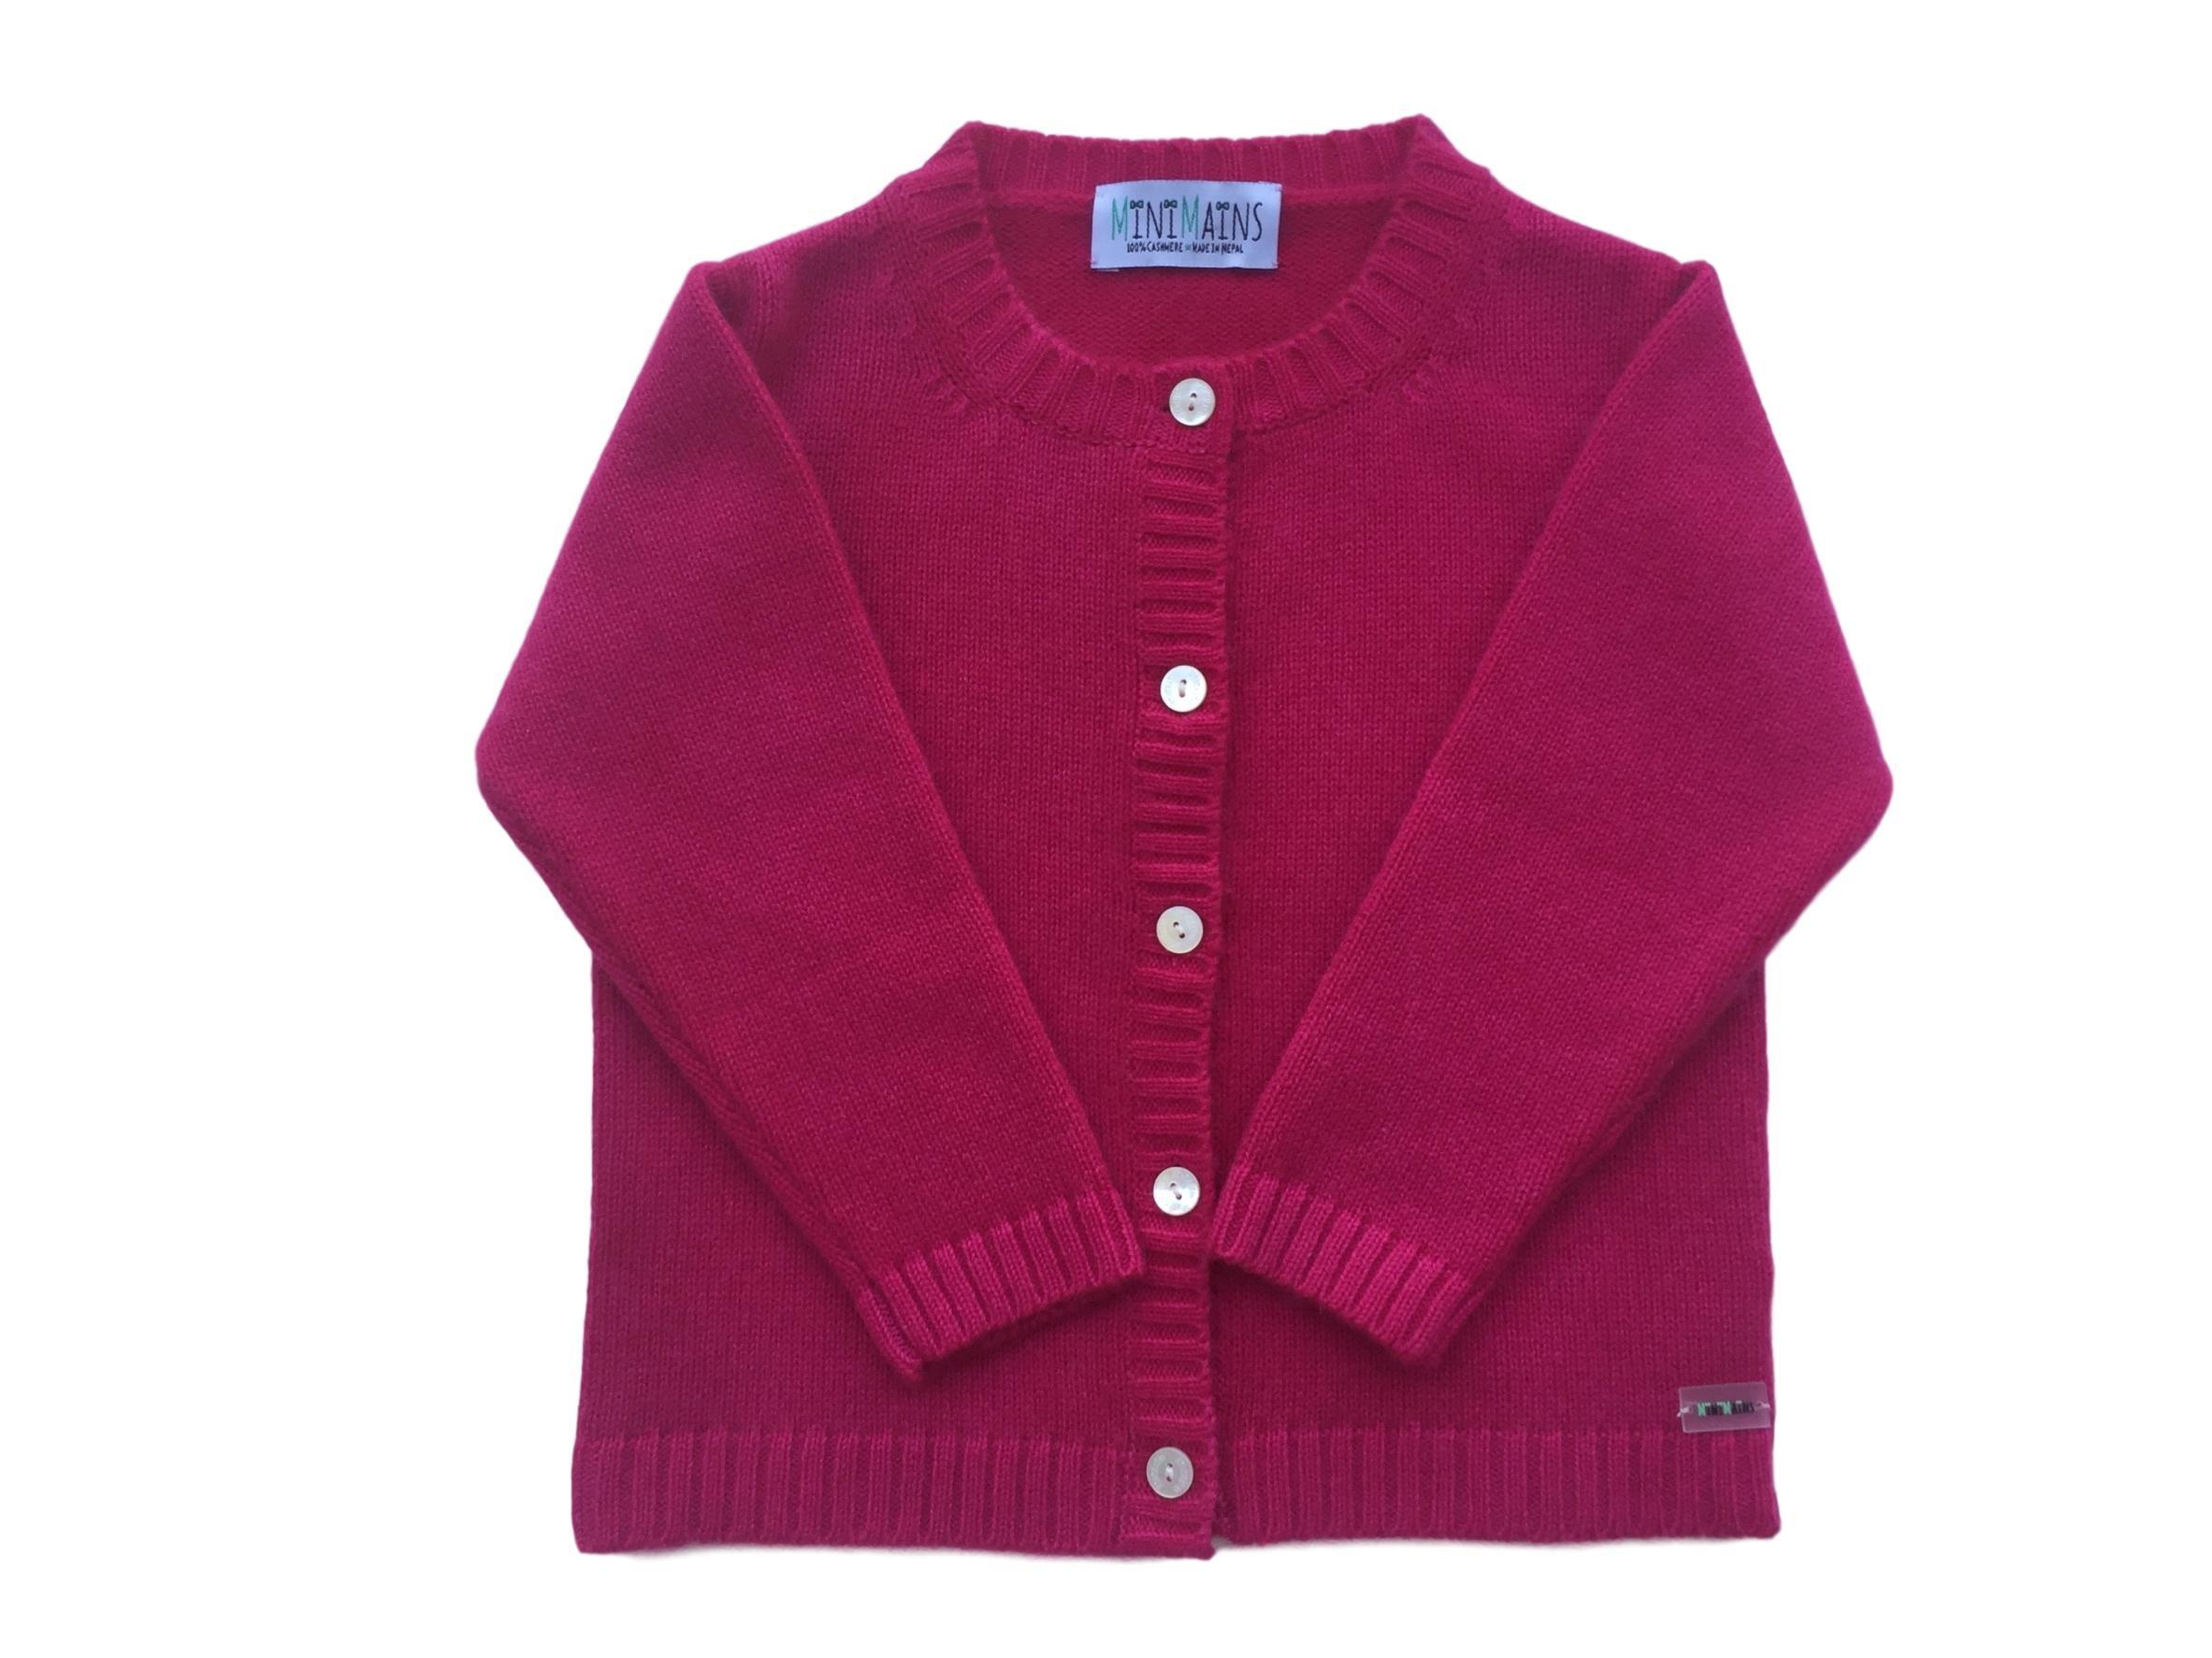 Minimains Little Girls' Pure Cashmere Round-Neck Cardigan 2y Hot Pink